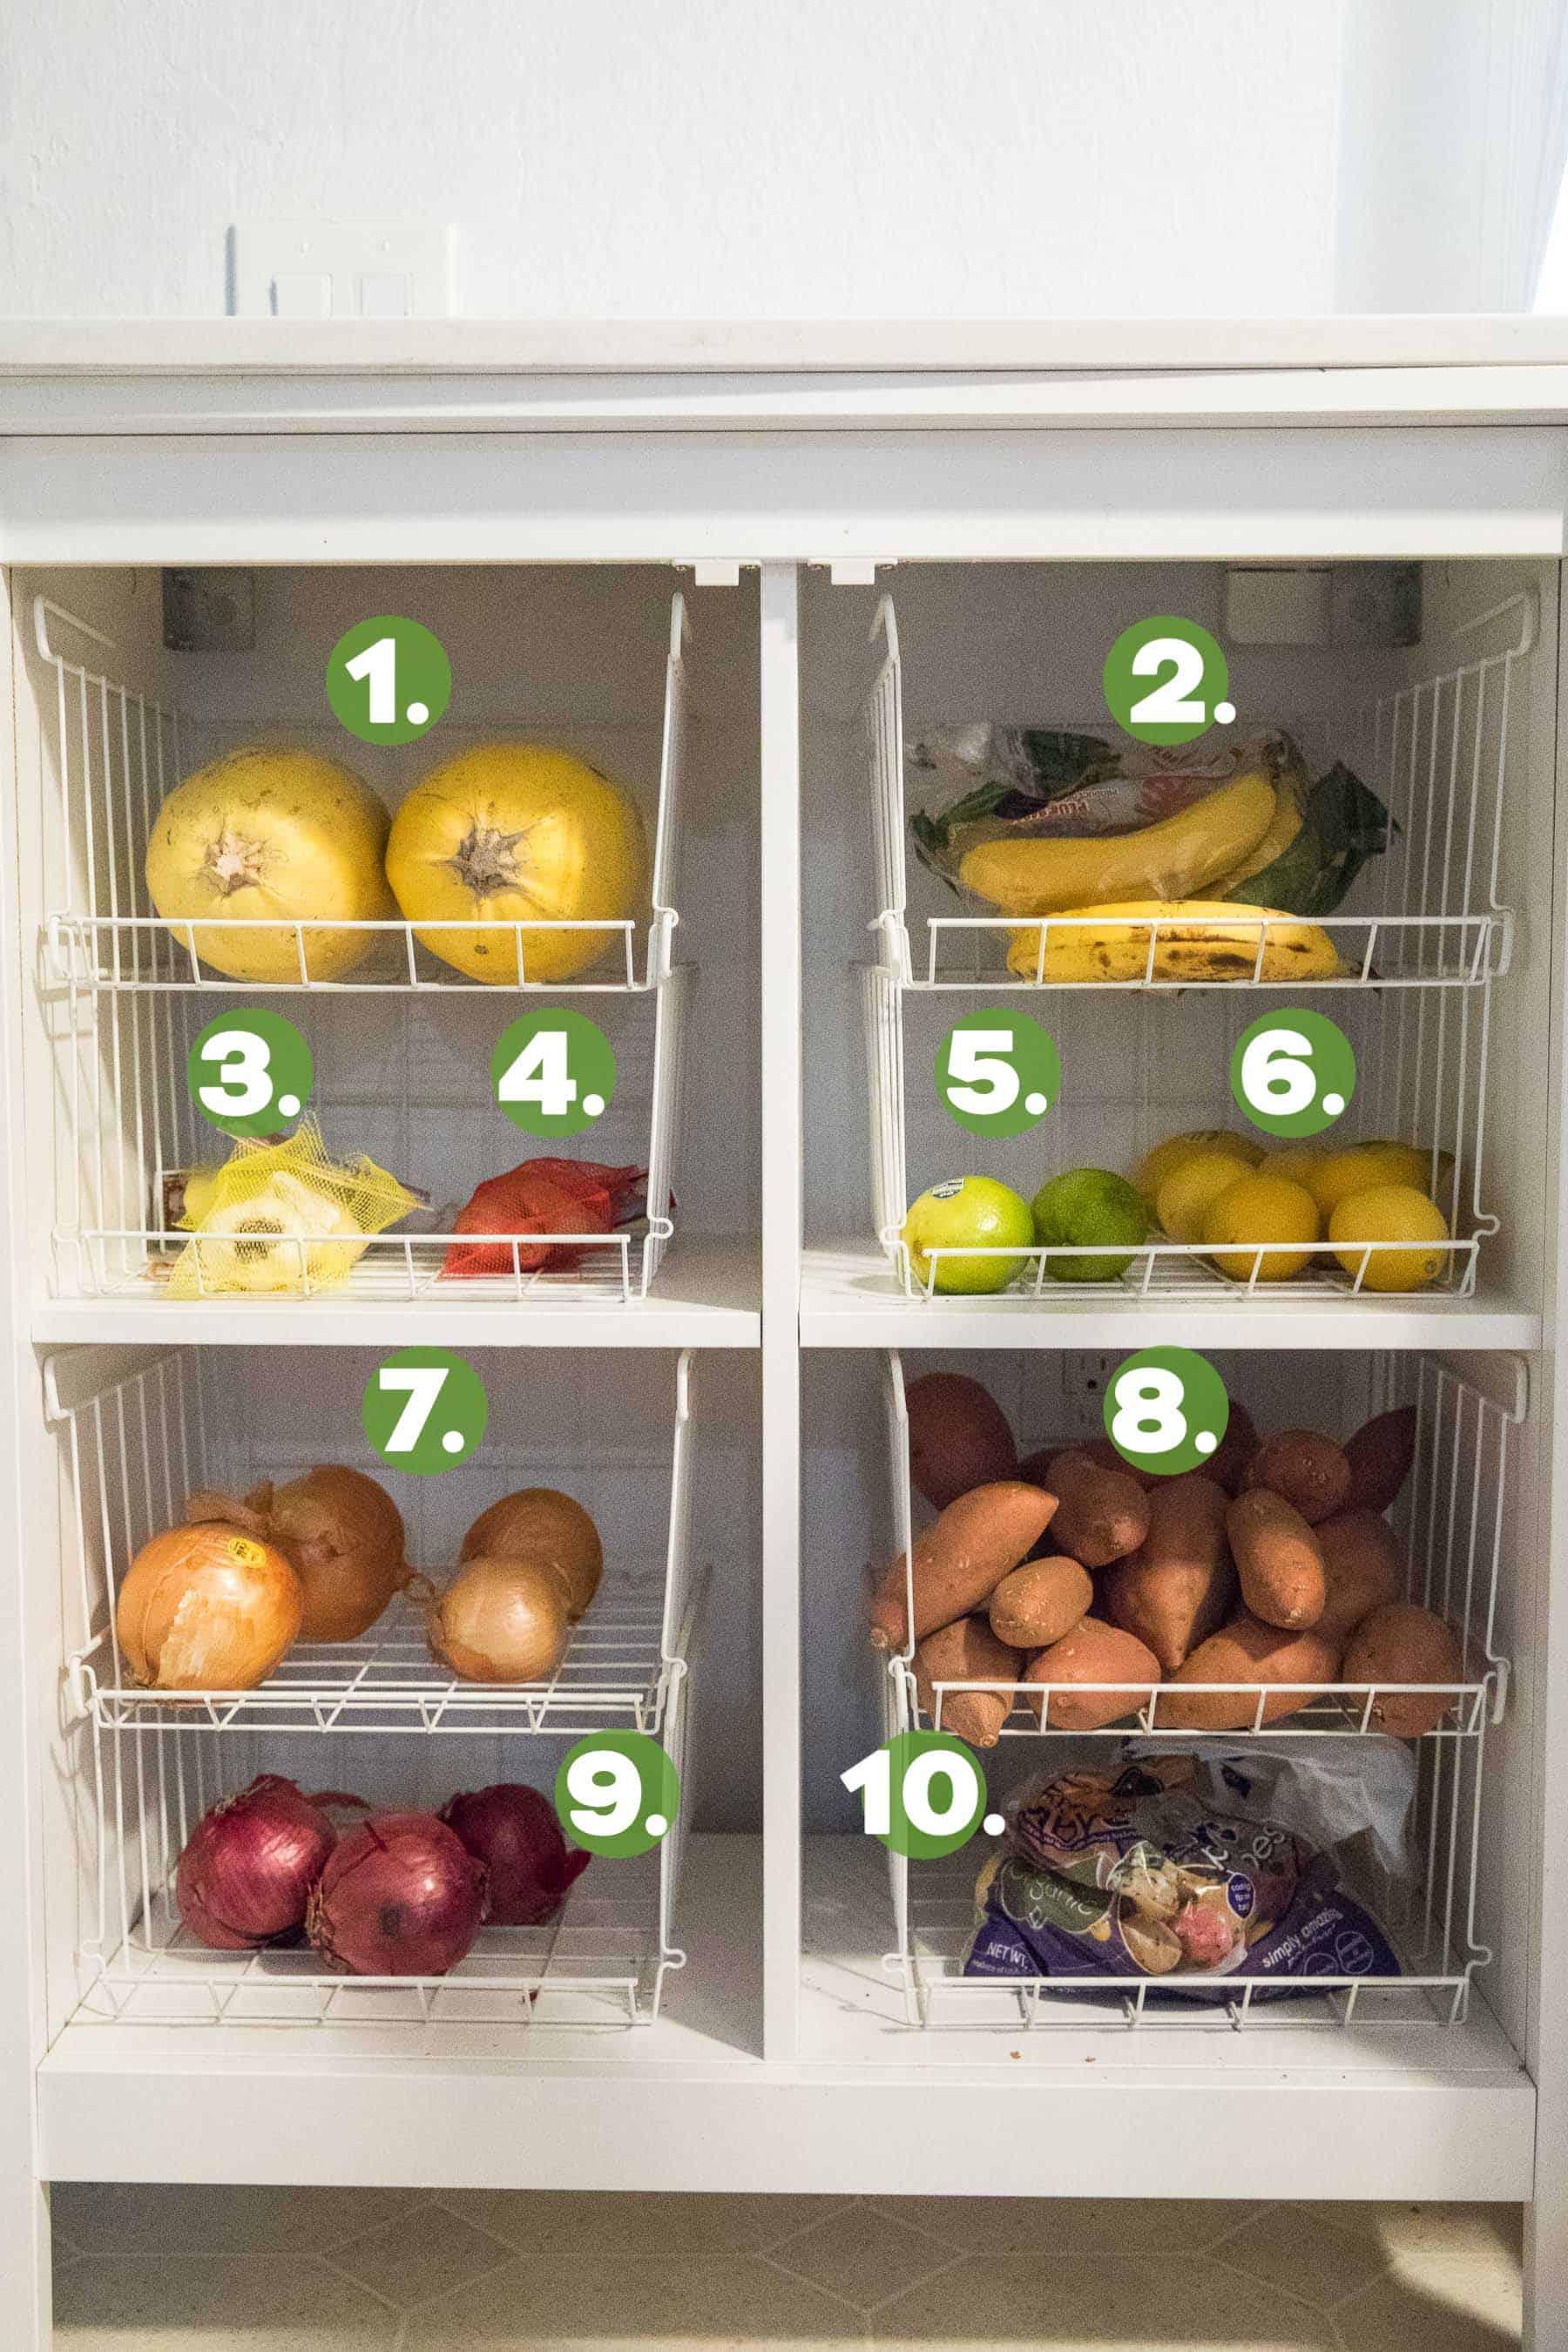 Dry Produce stocked whole30 items